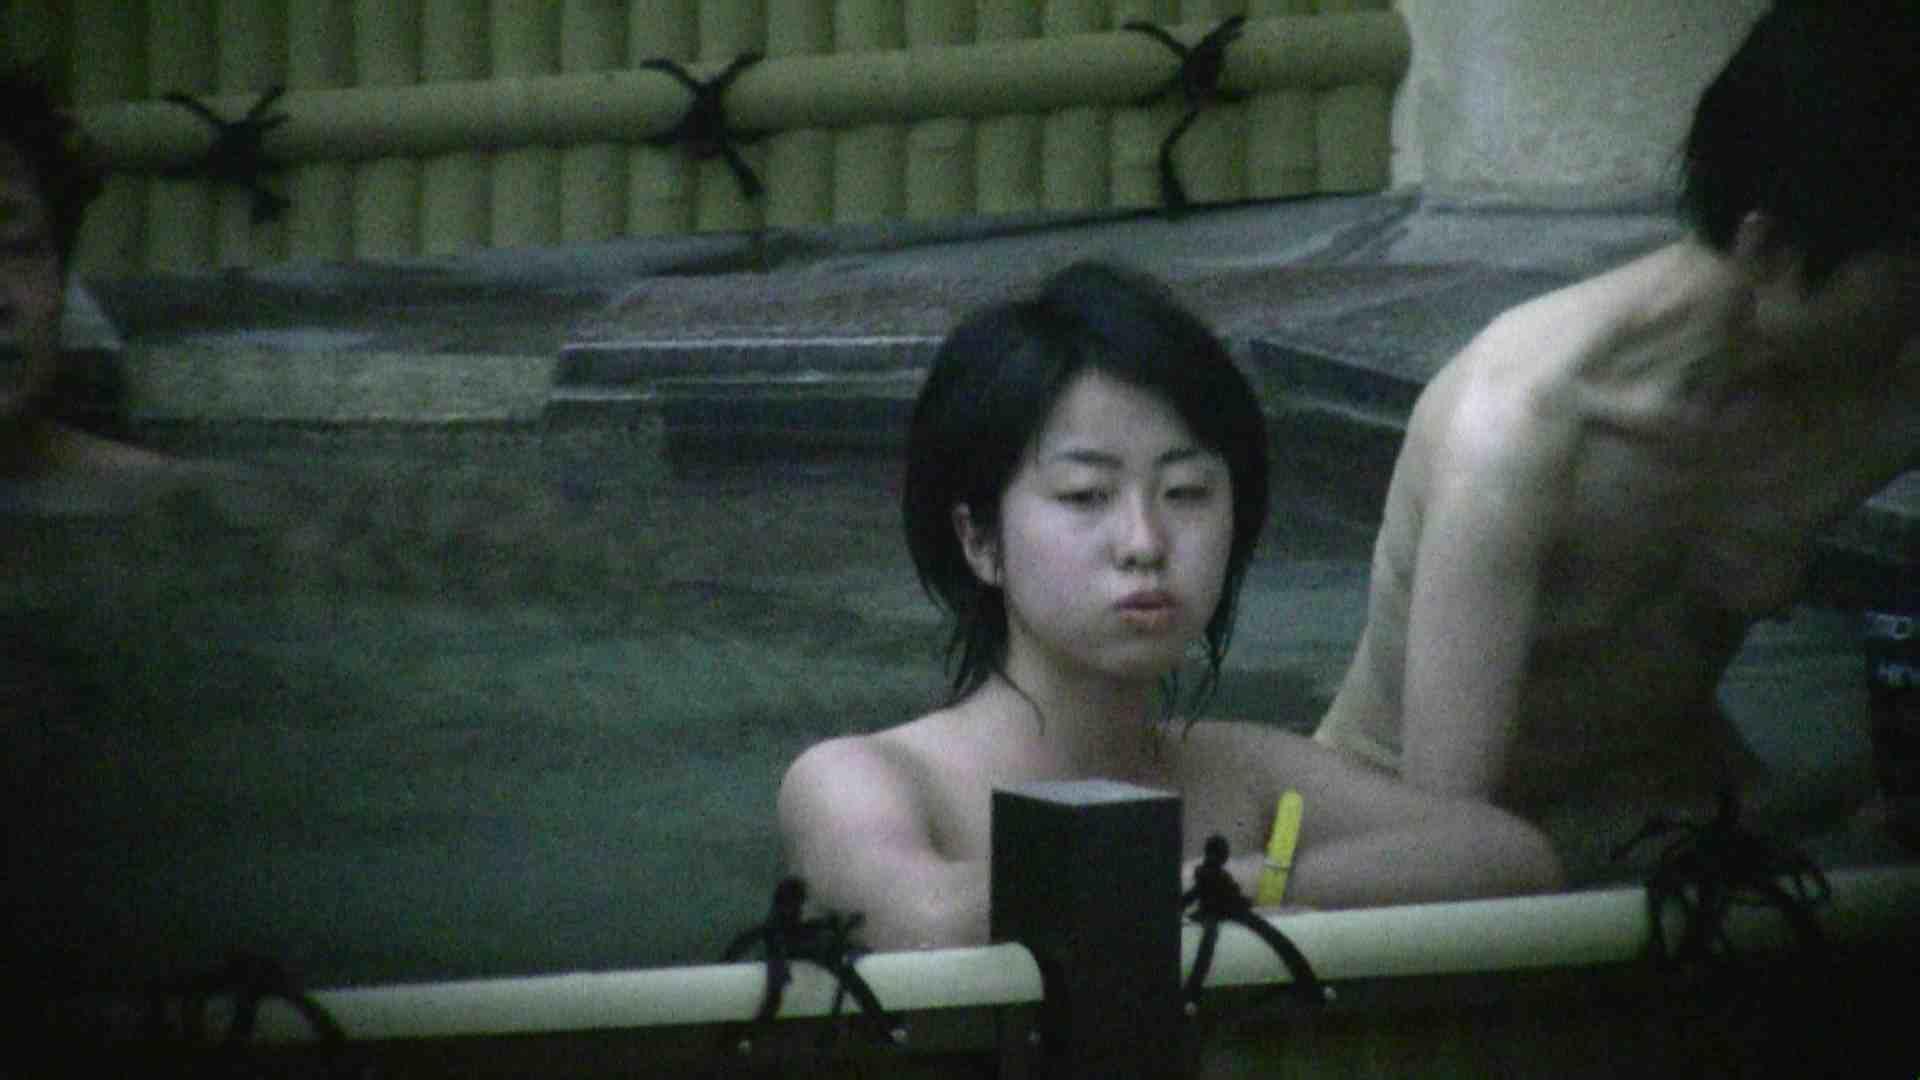 Aquaな露天風呂Vol.112 0 | 0  68連発 35